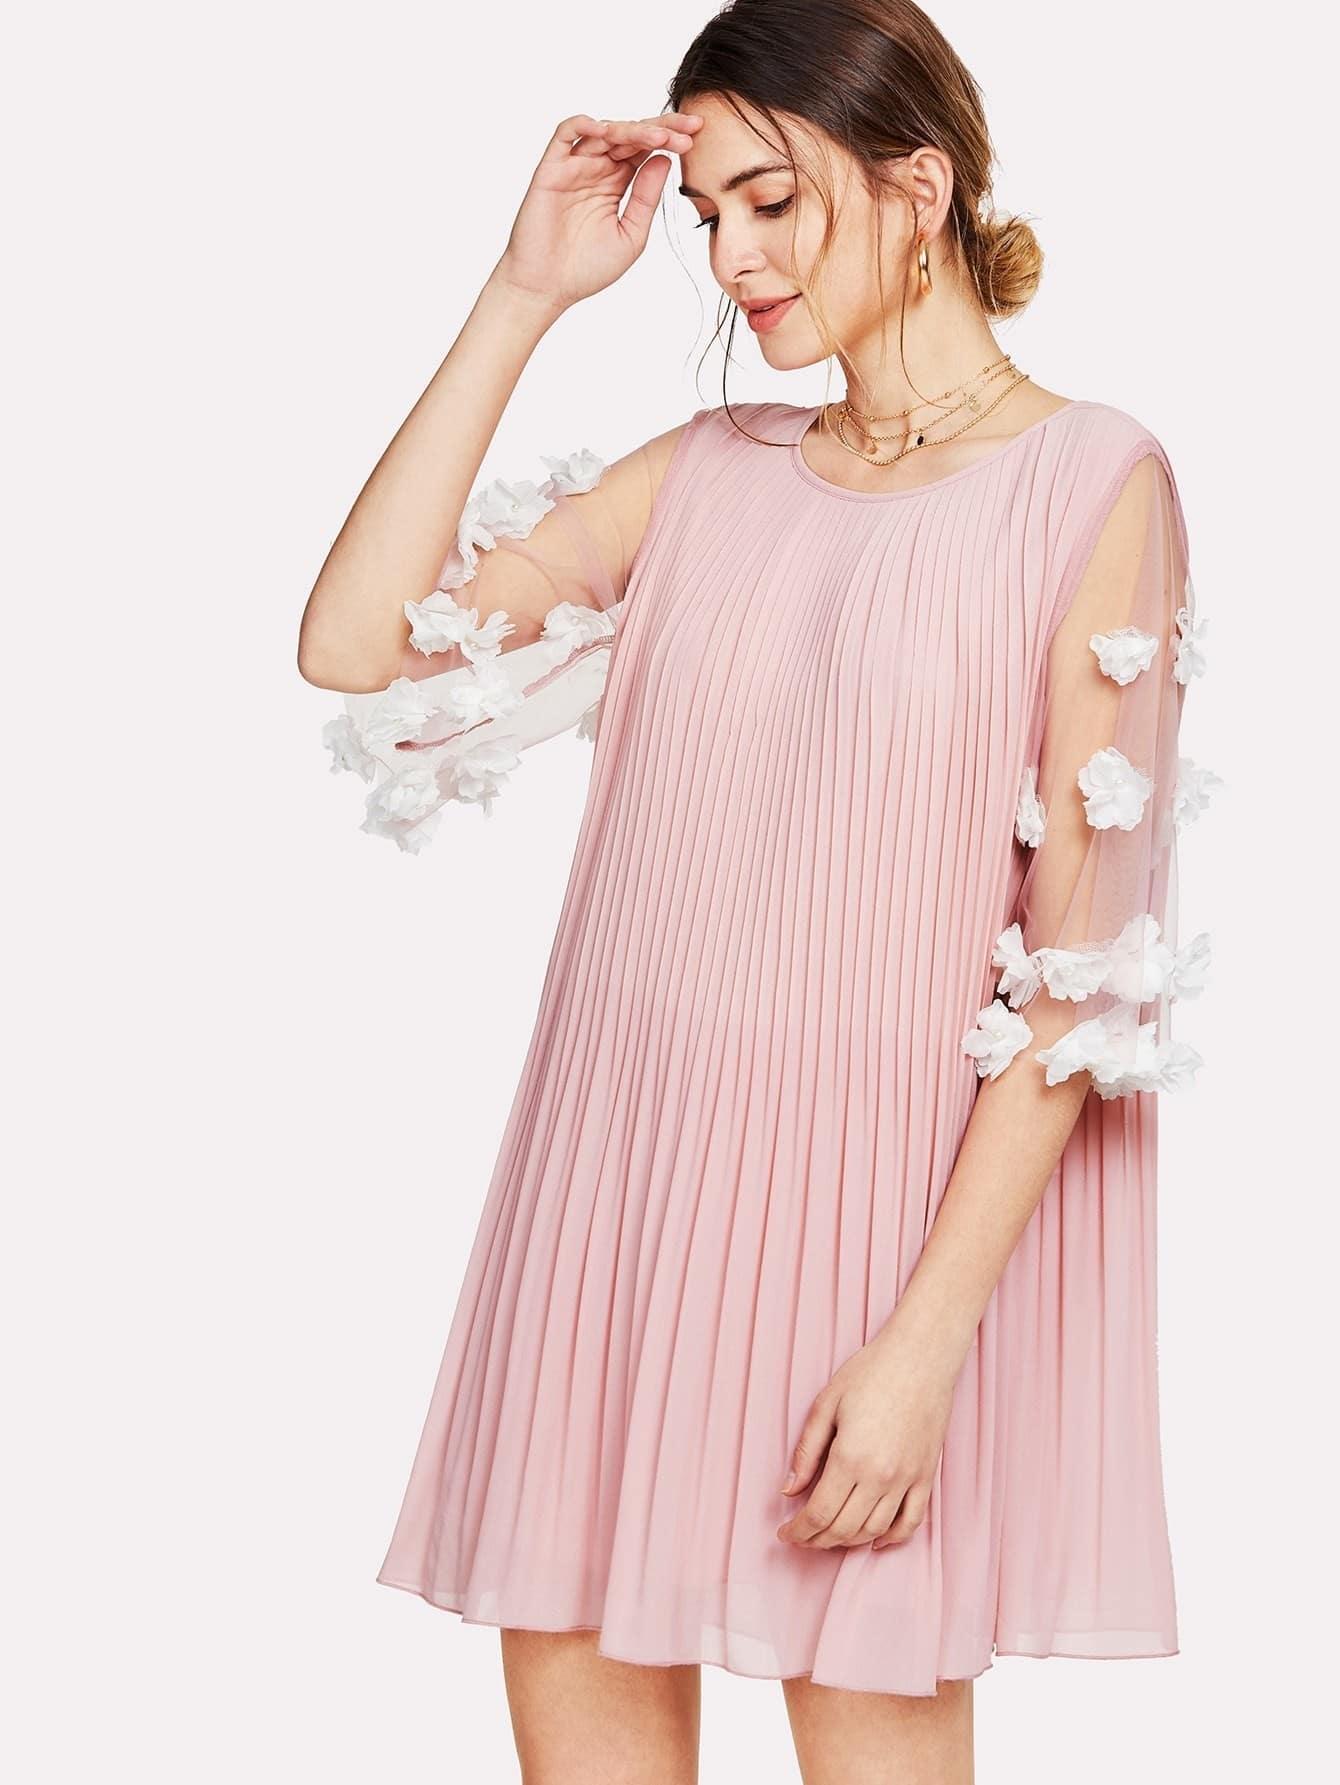 Applique Mesh Sleeve Pleated Swing Dress mesh panel sleeve dress